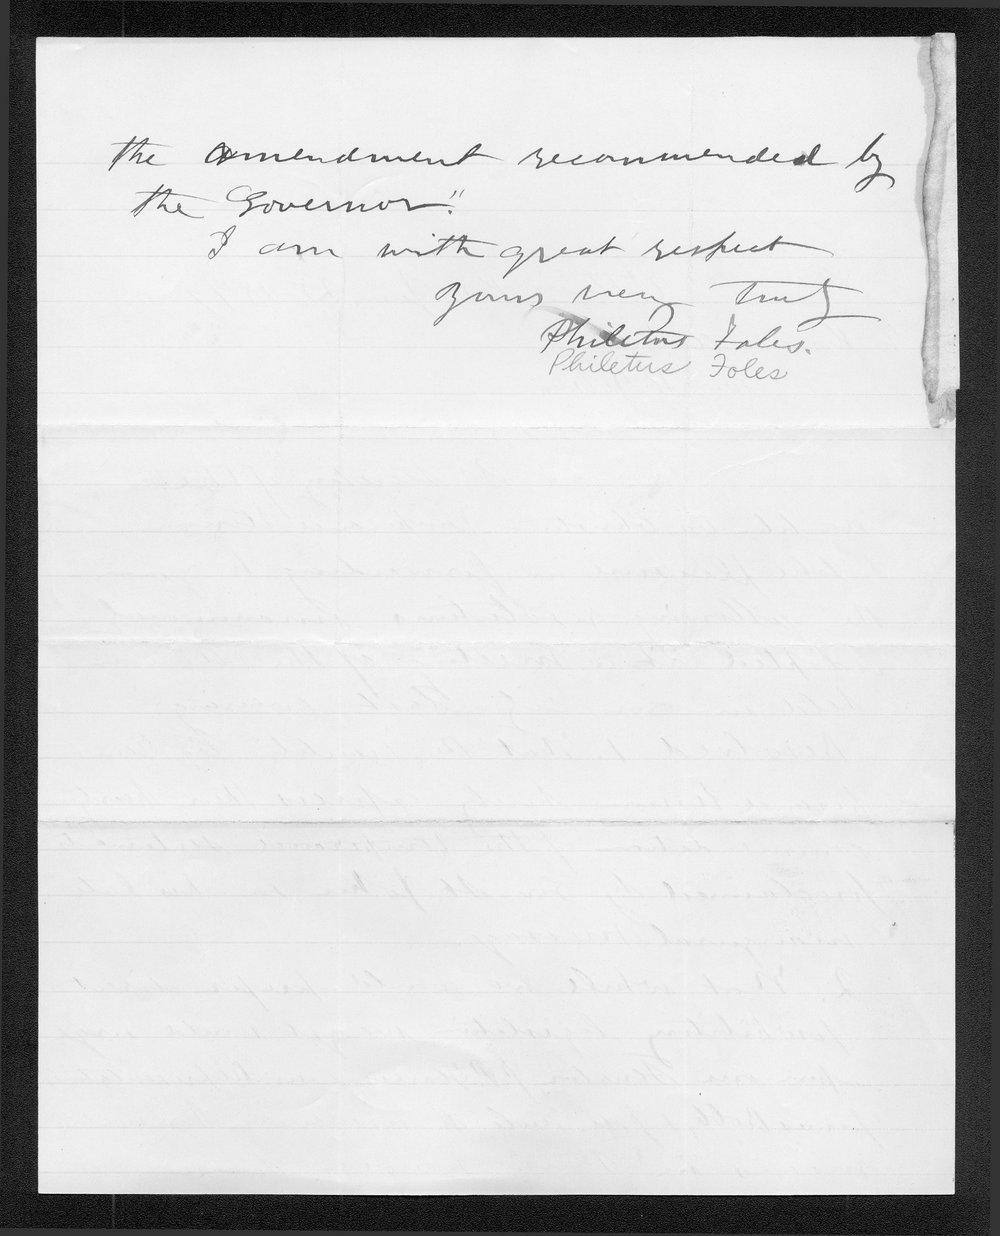 Governor John St. John prohibition received correspondence - 4